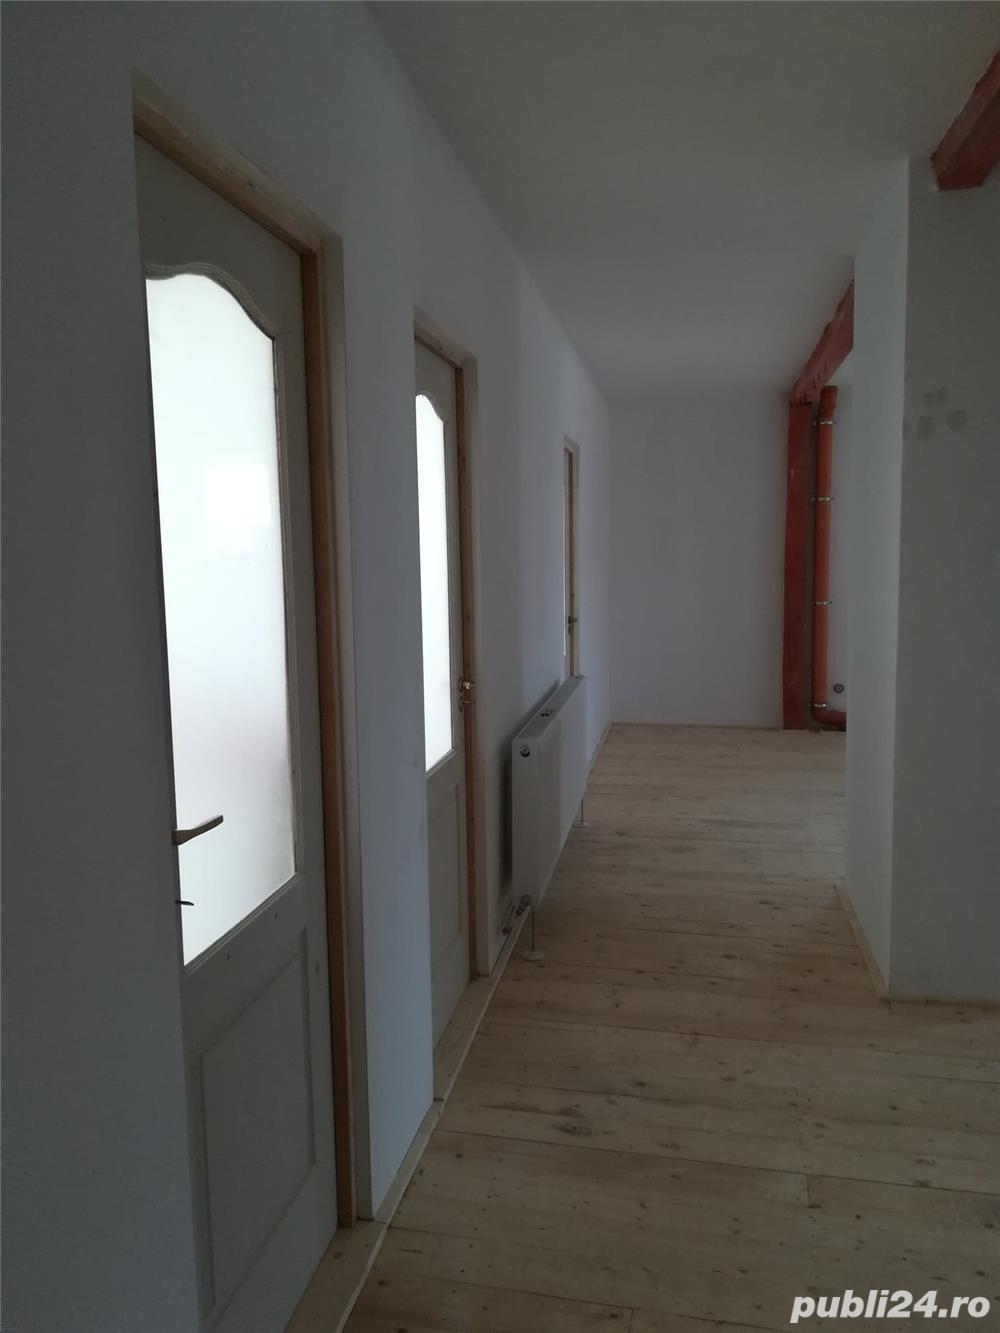 PF de inchiriat spatiu ptr birouri, sediu firma 130 m2, zona Cipariu, Cluj